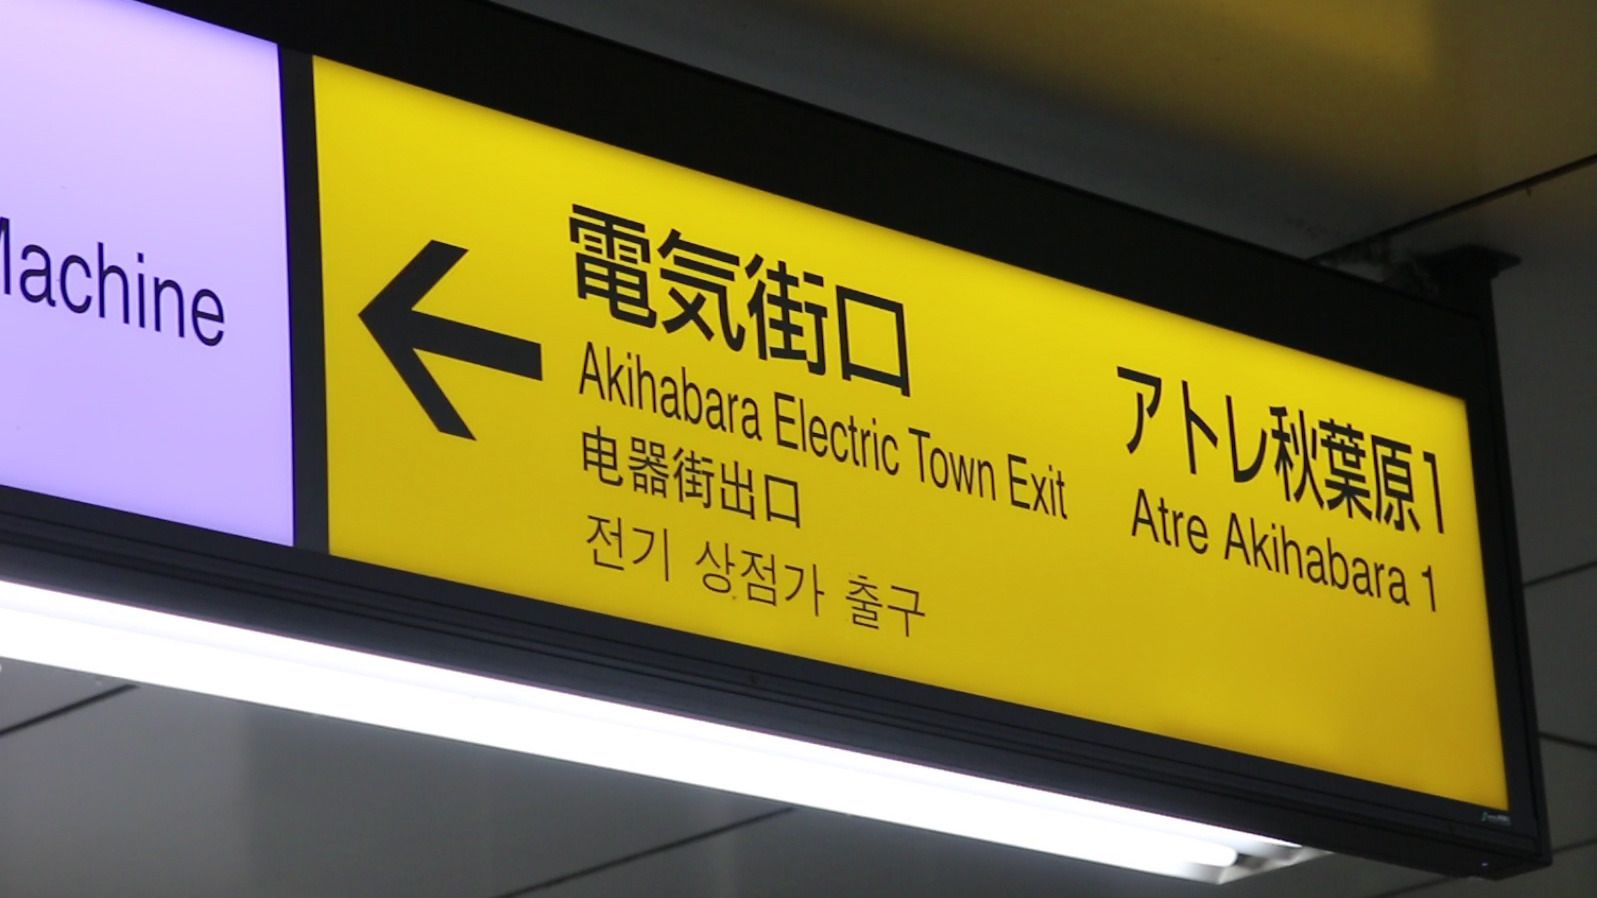 Elektronikkhimmelen Akihabara